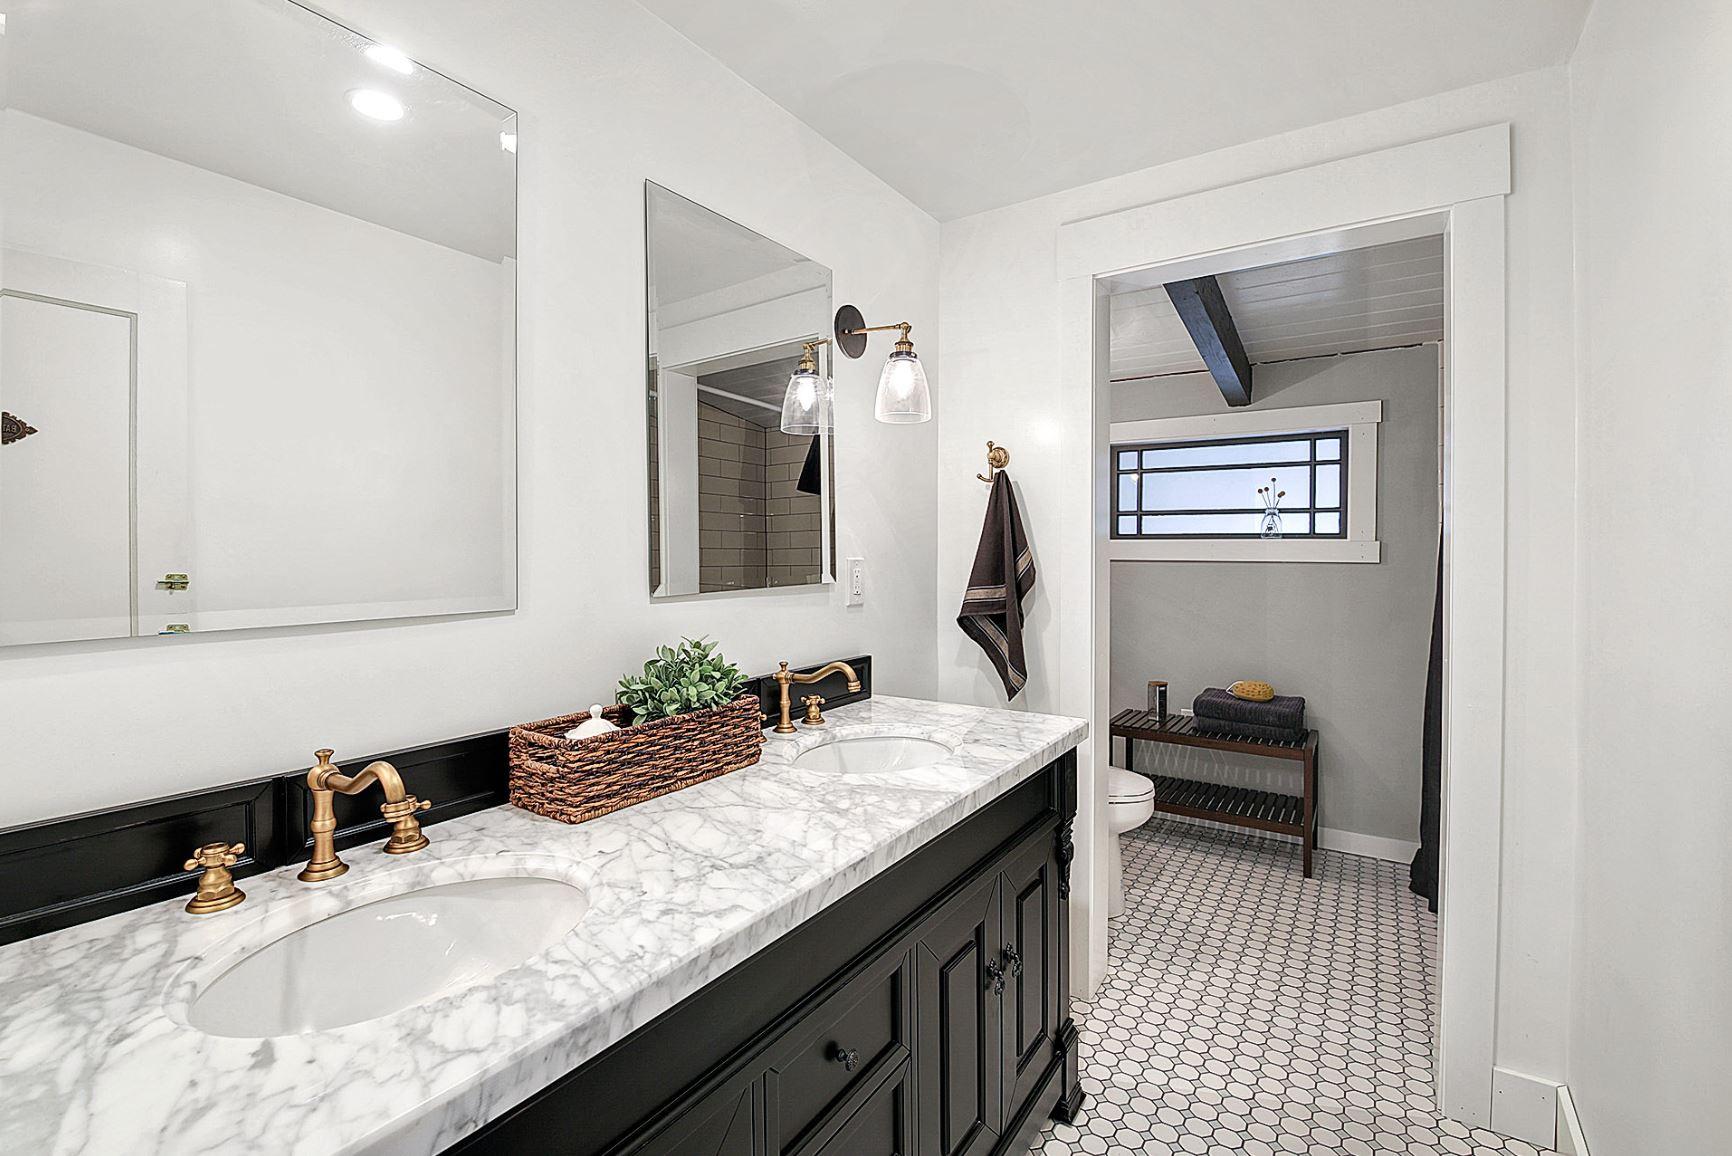 southern_bathroom.JPG